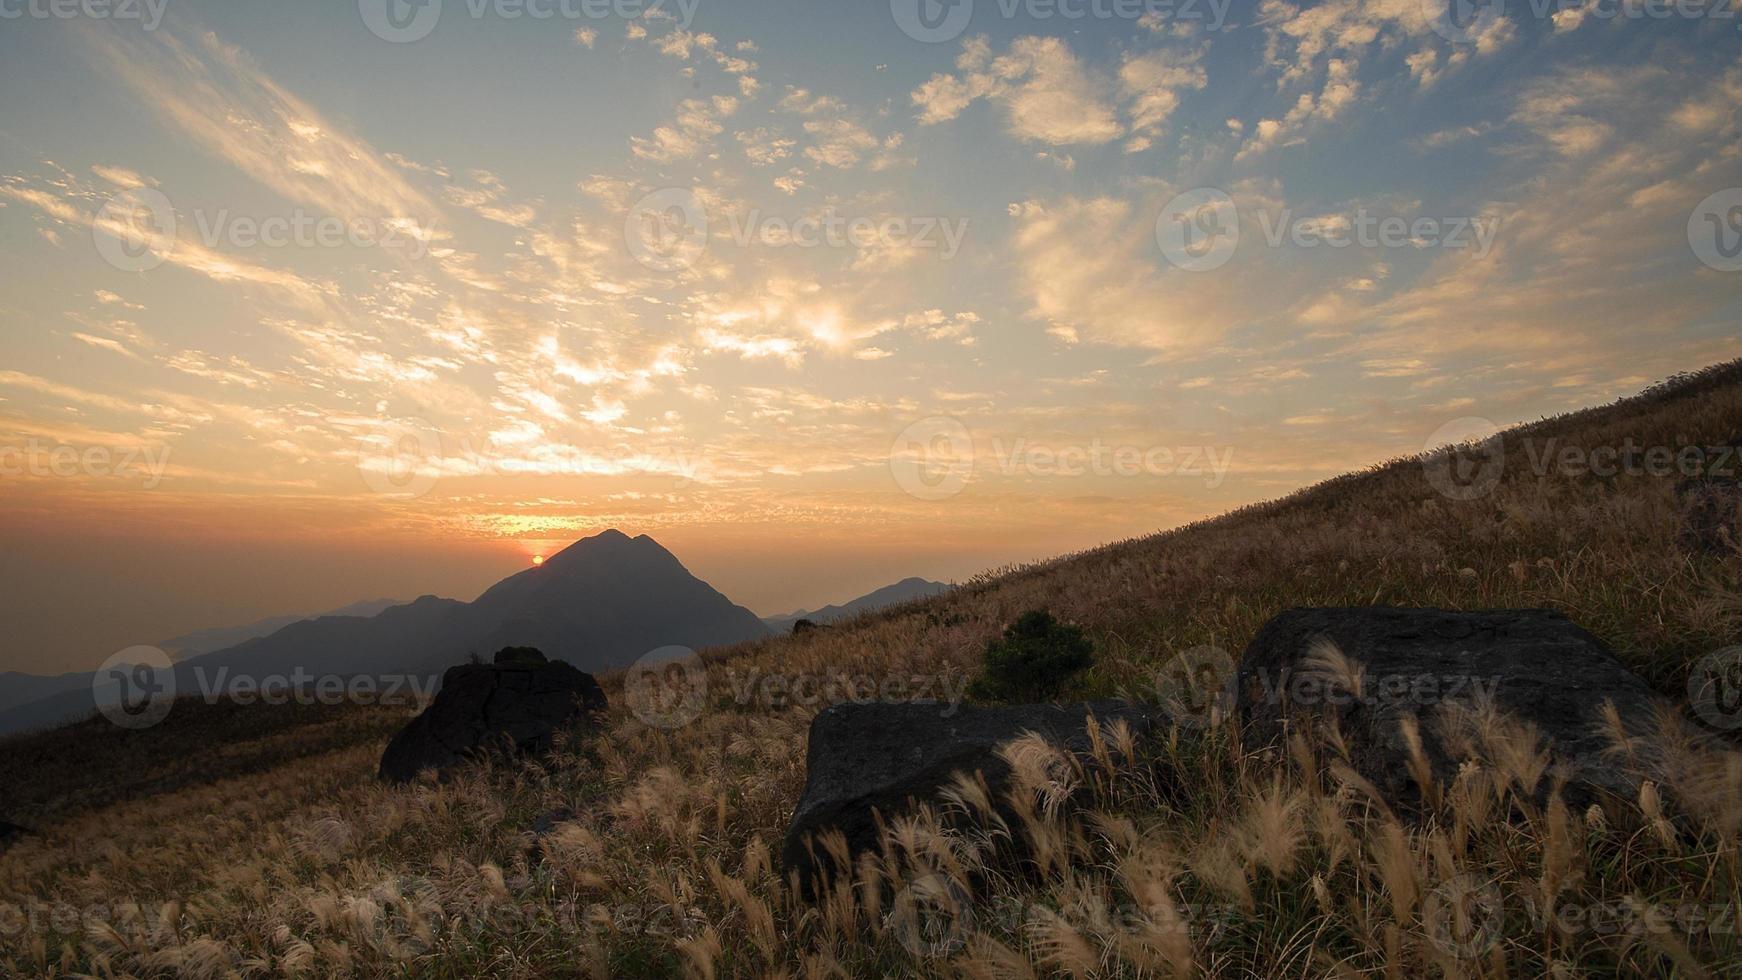 pôr do sol com nuvens dispersas (trilha lantau, hong kong) foto